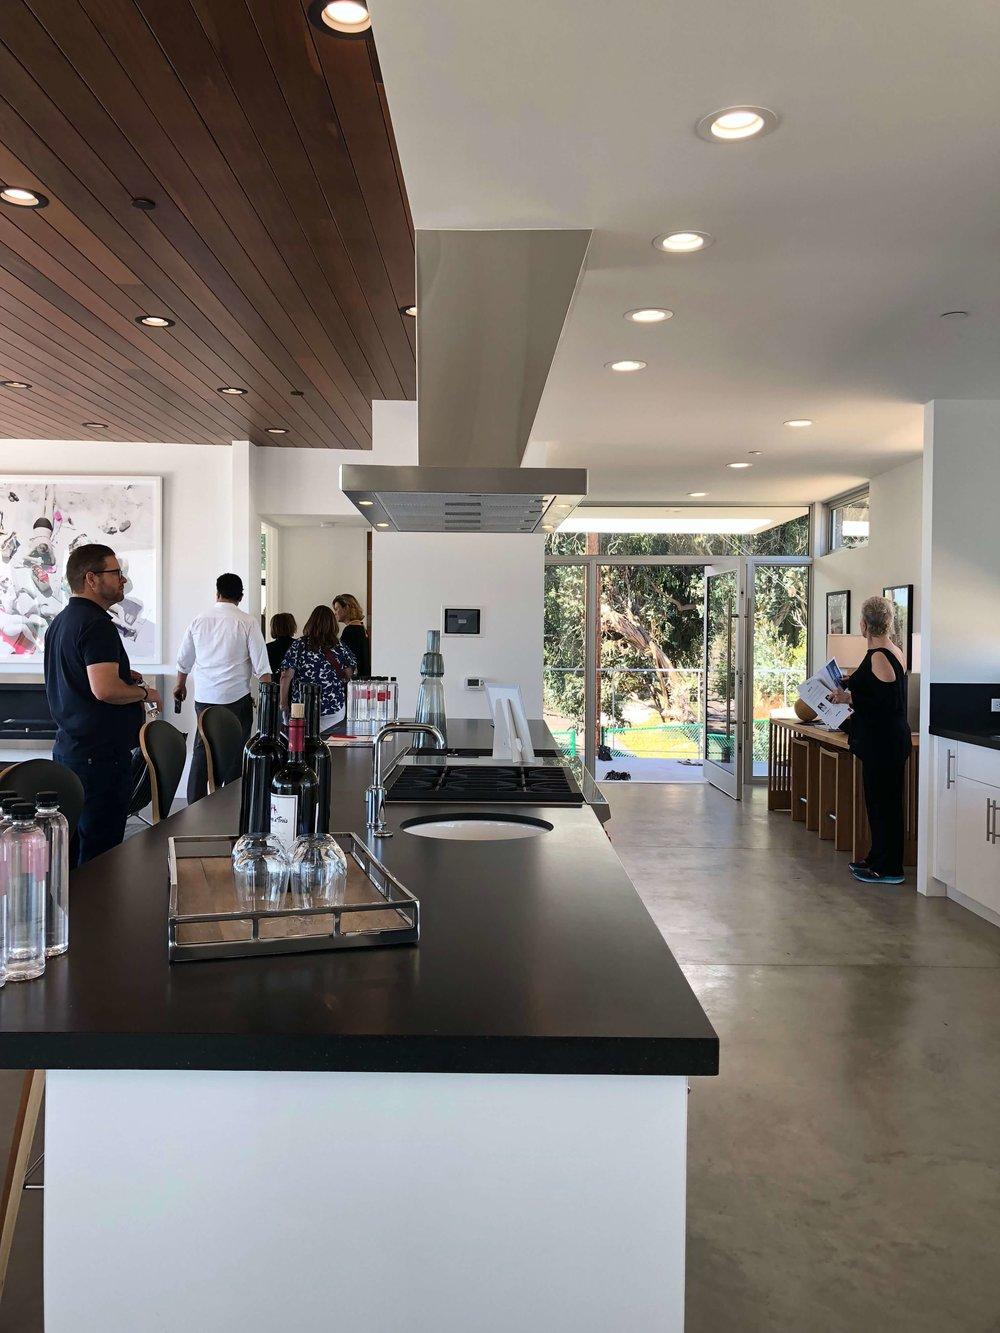 California contemporary design - Dwell on Design's Fall Home Tour, Designer: Vitus Mitare #contemporaryarchitecture #kitchenisland